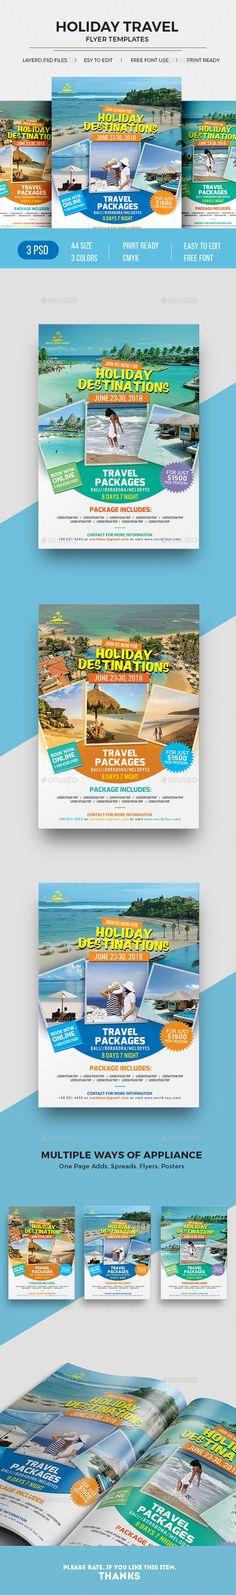 71 Best Travel Flyer Images On Pinterest